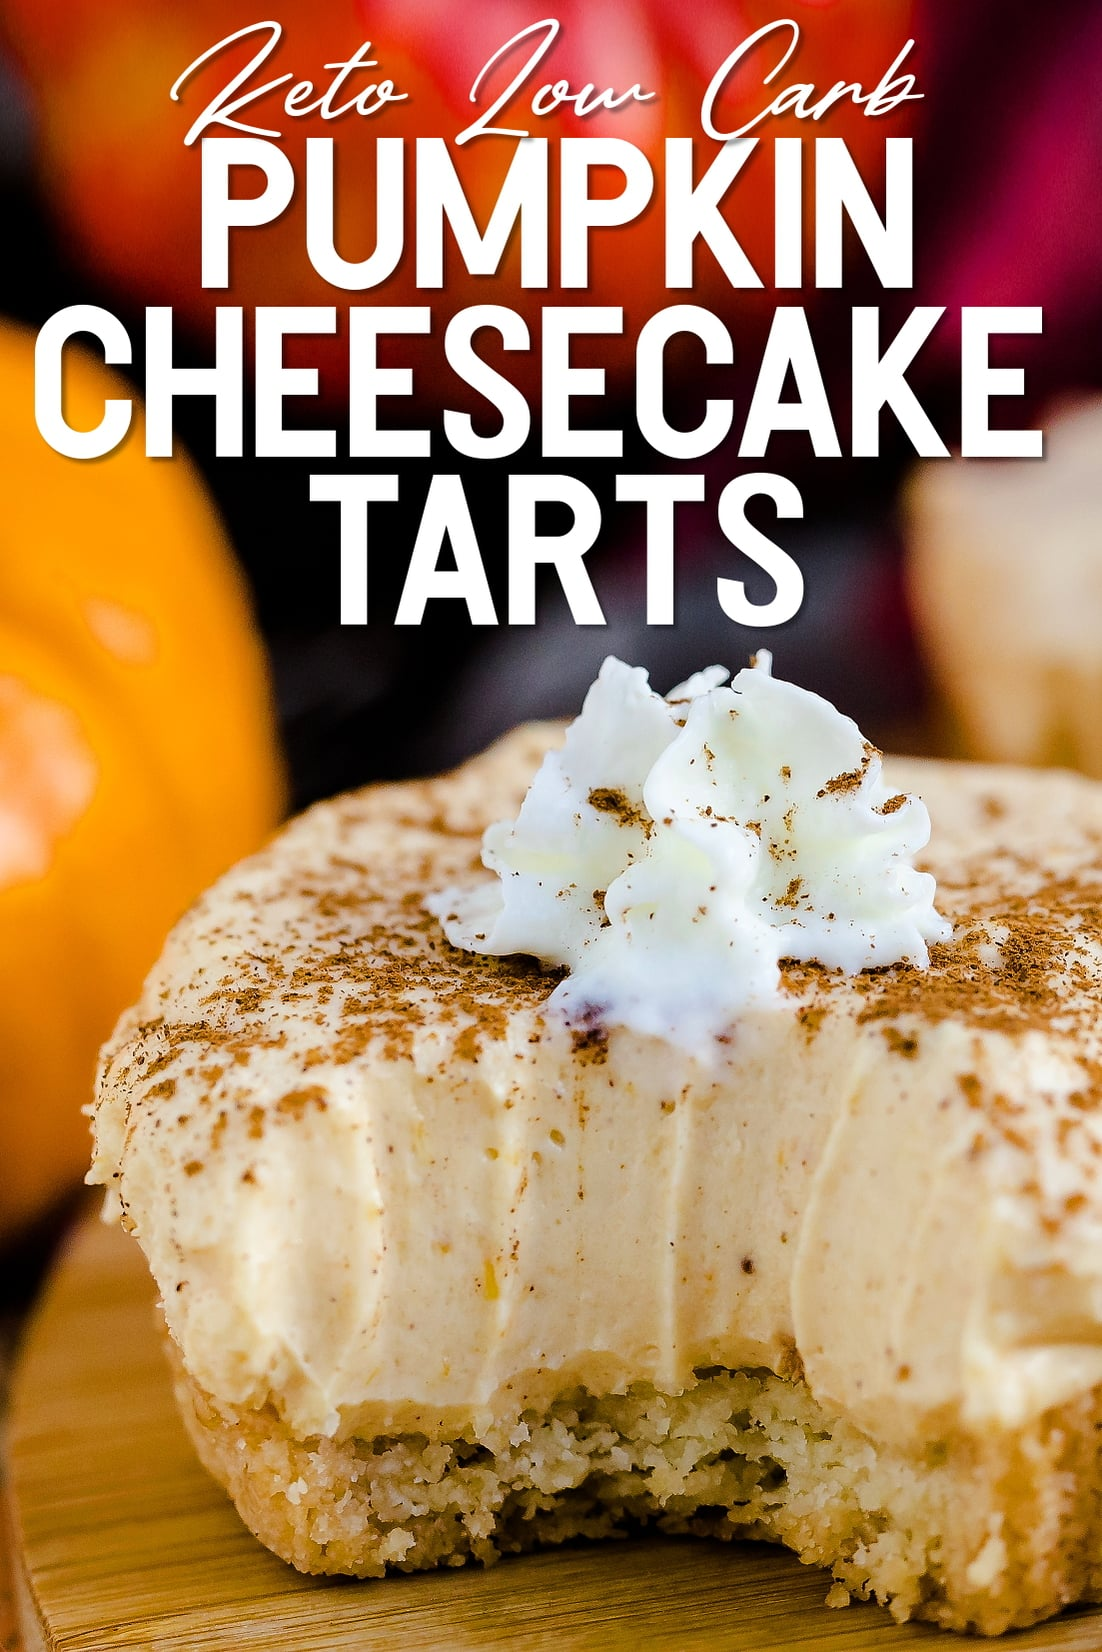 Keto Low Carb Pumpkin Cheesecake Tart being biten into